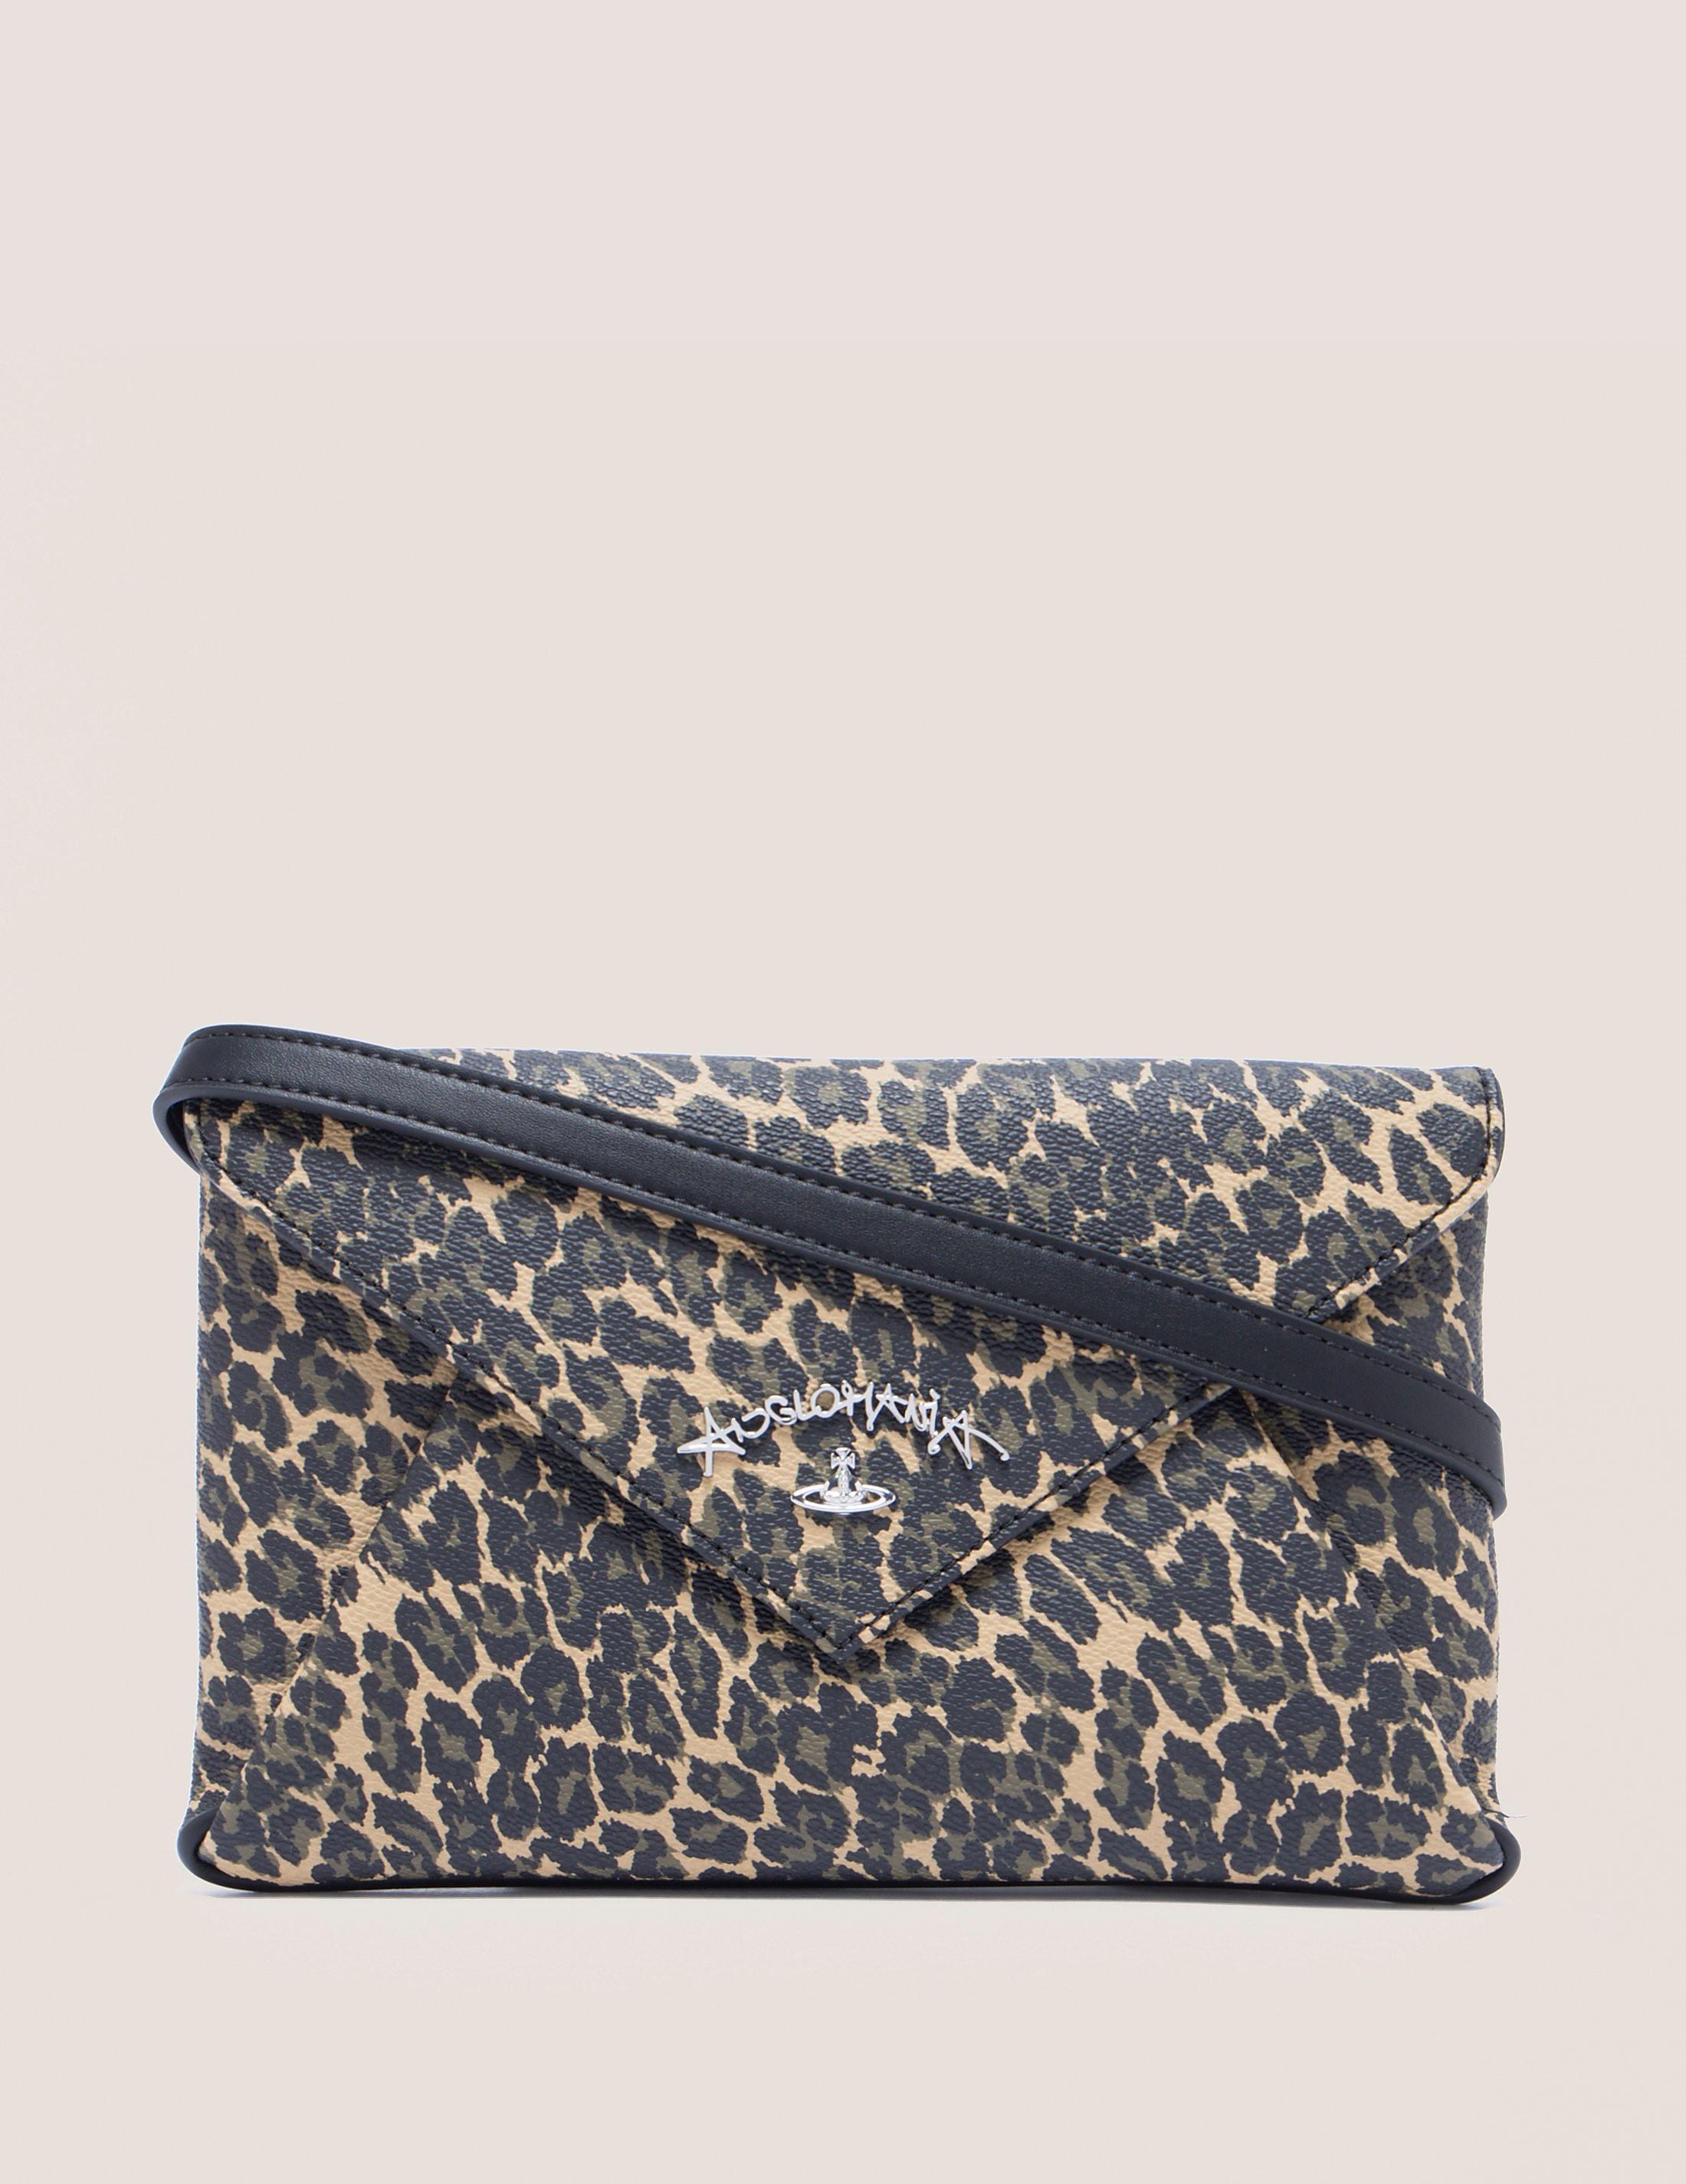 Vivienne Westwood Anglomania Envelope Crossbody Bag